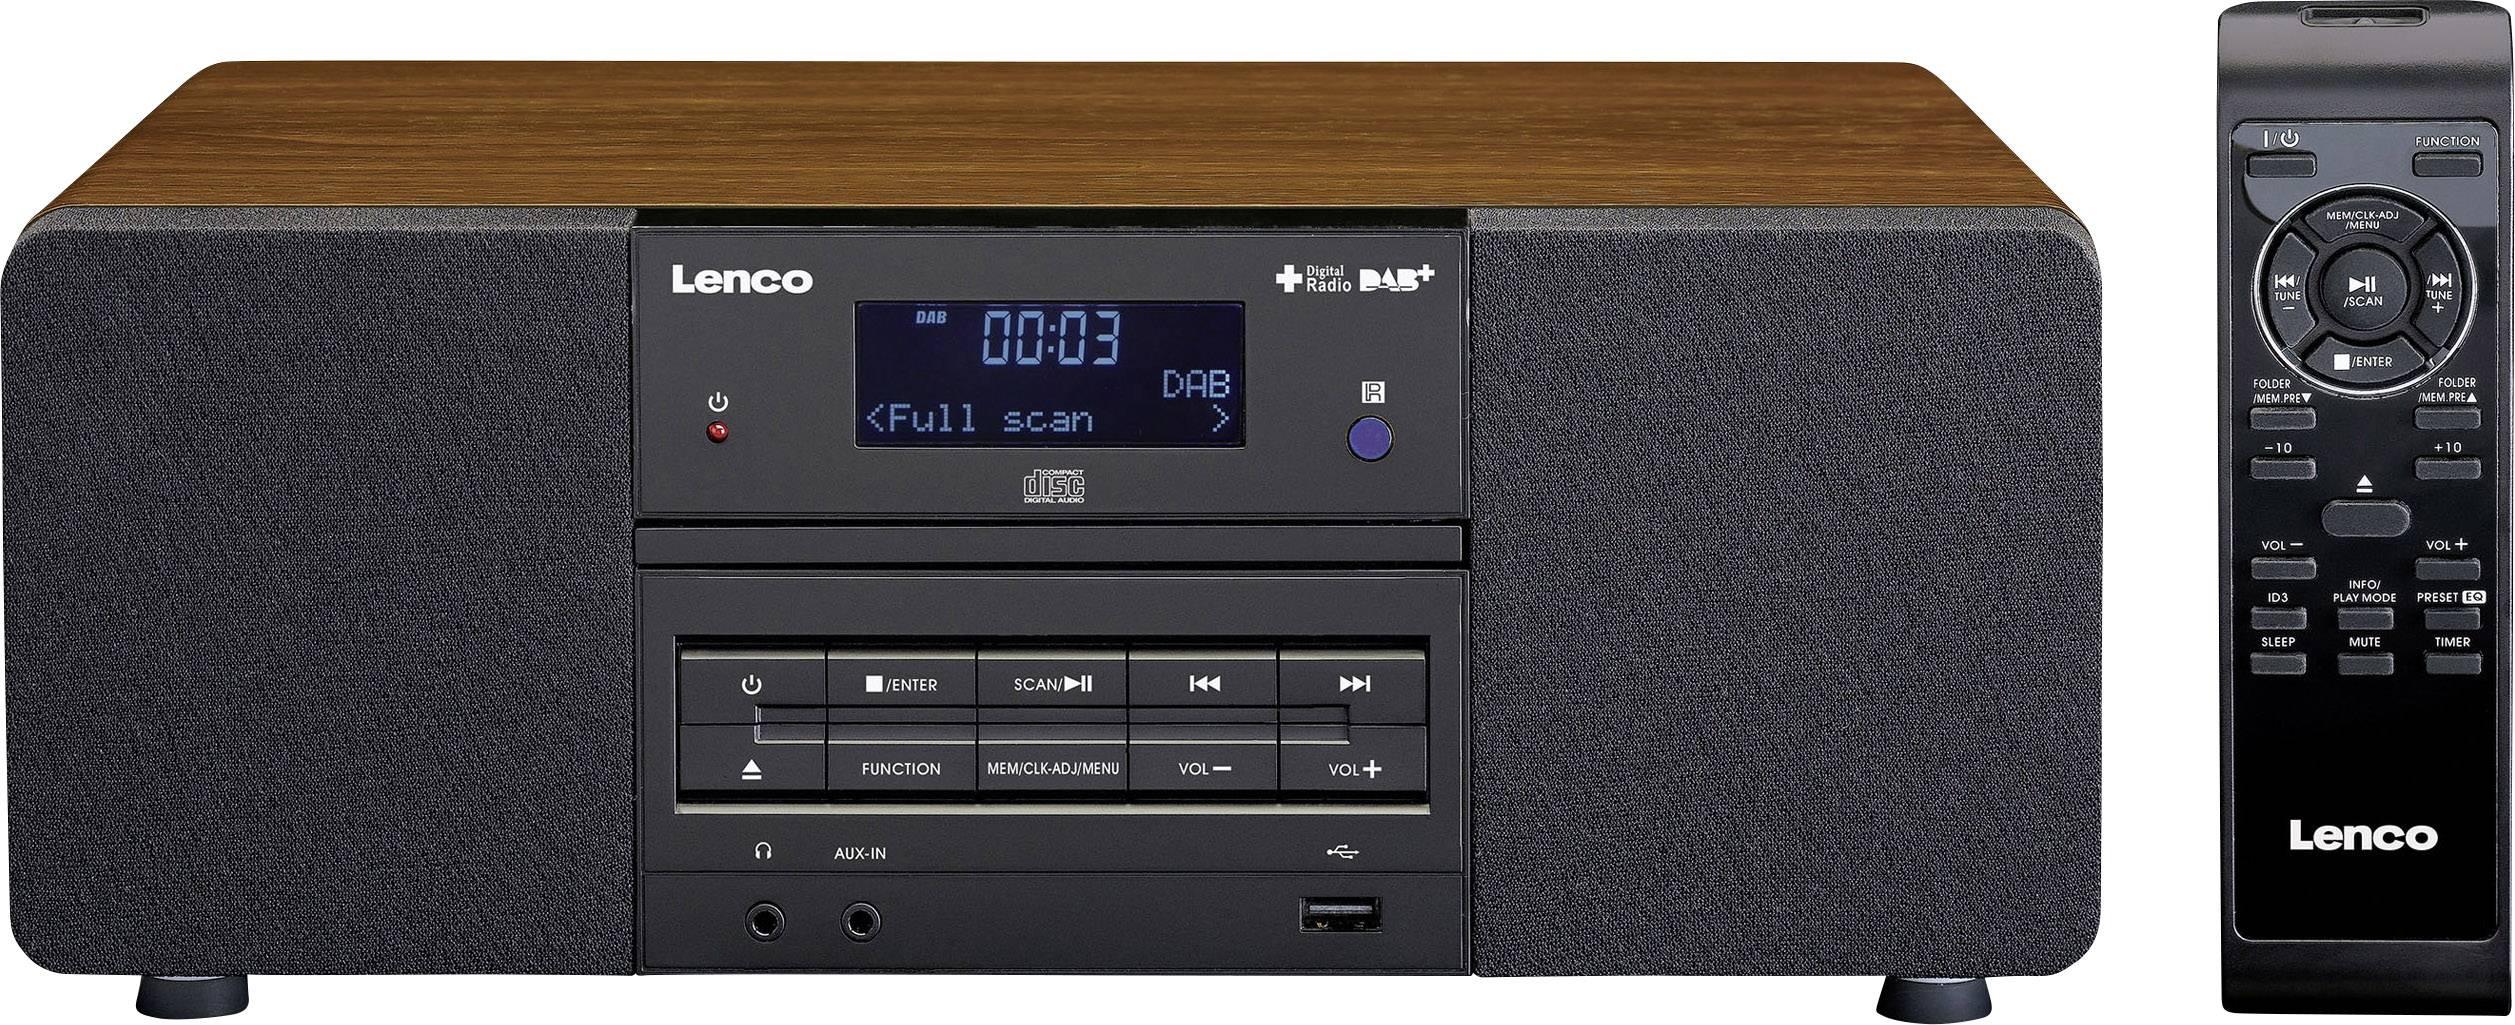 Lenco DAR-050 DAB+ Radio da tavolo CD, USB, AUX, DAB+ Legno